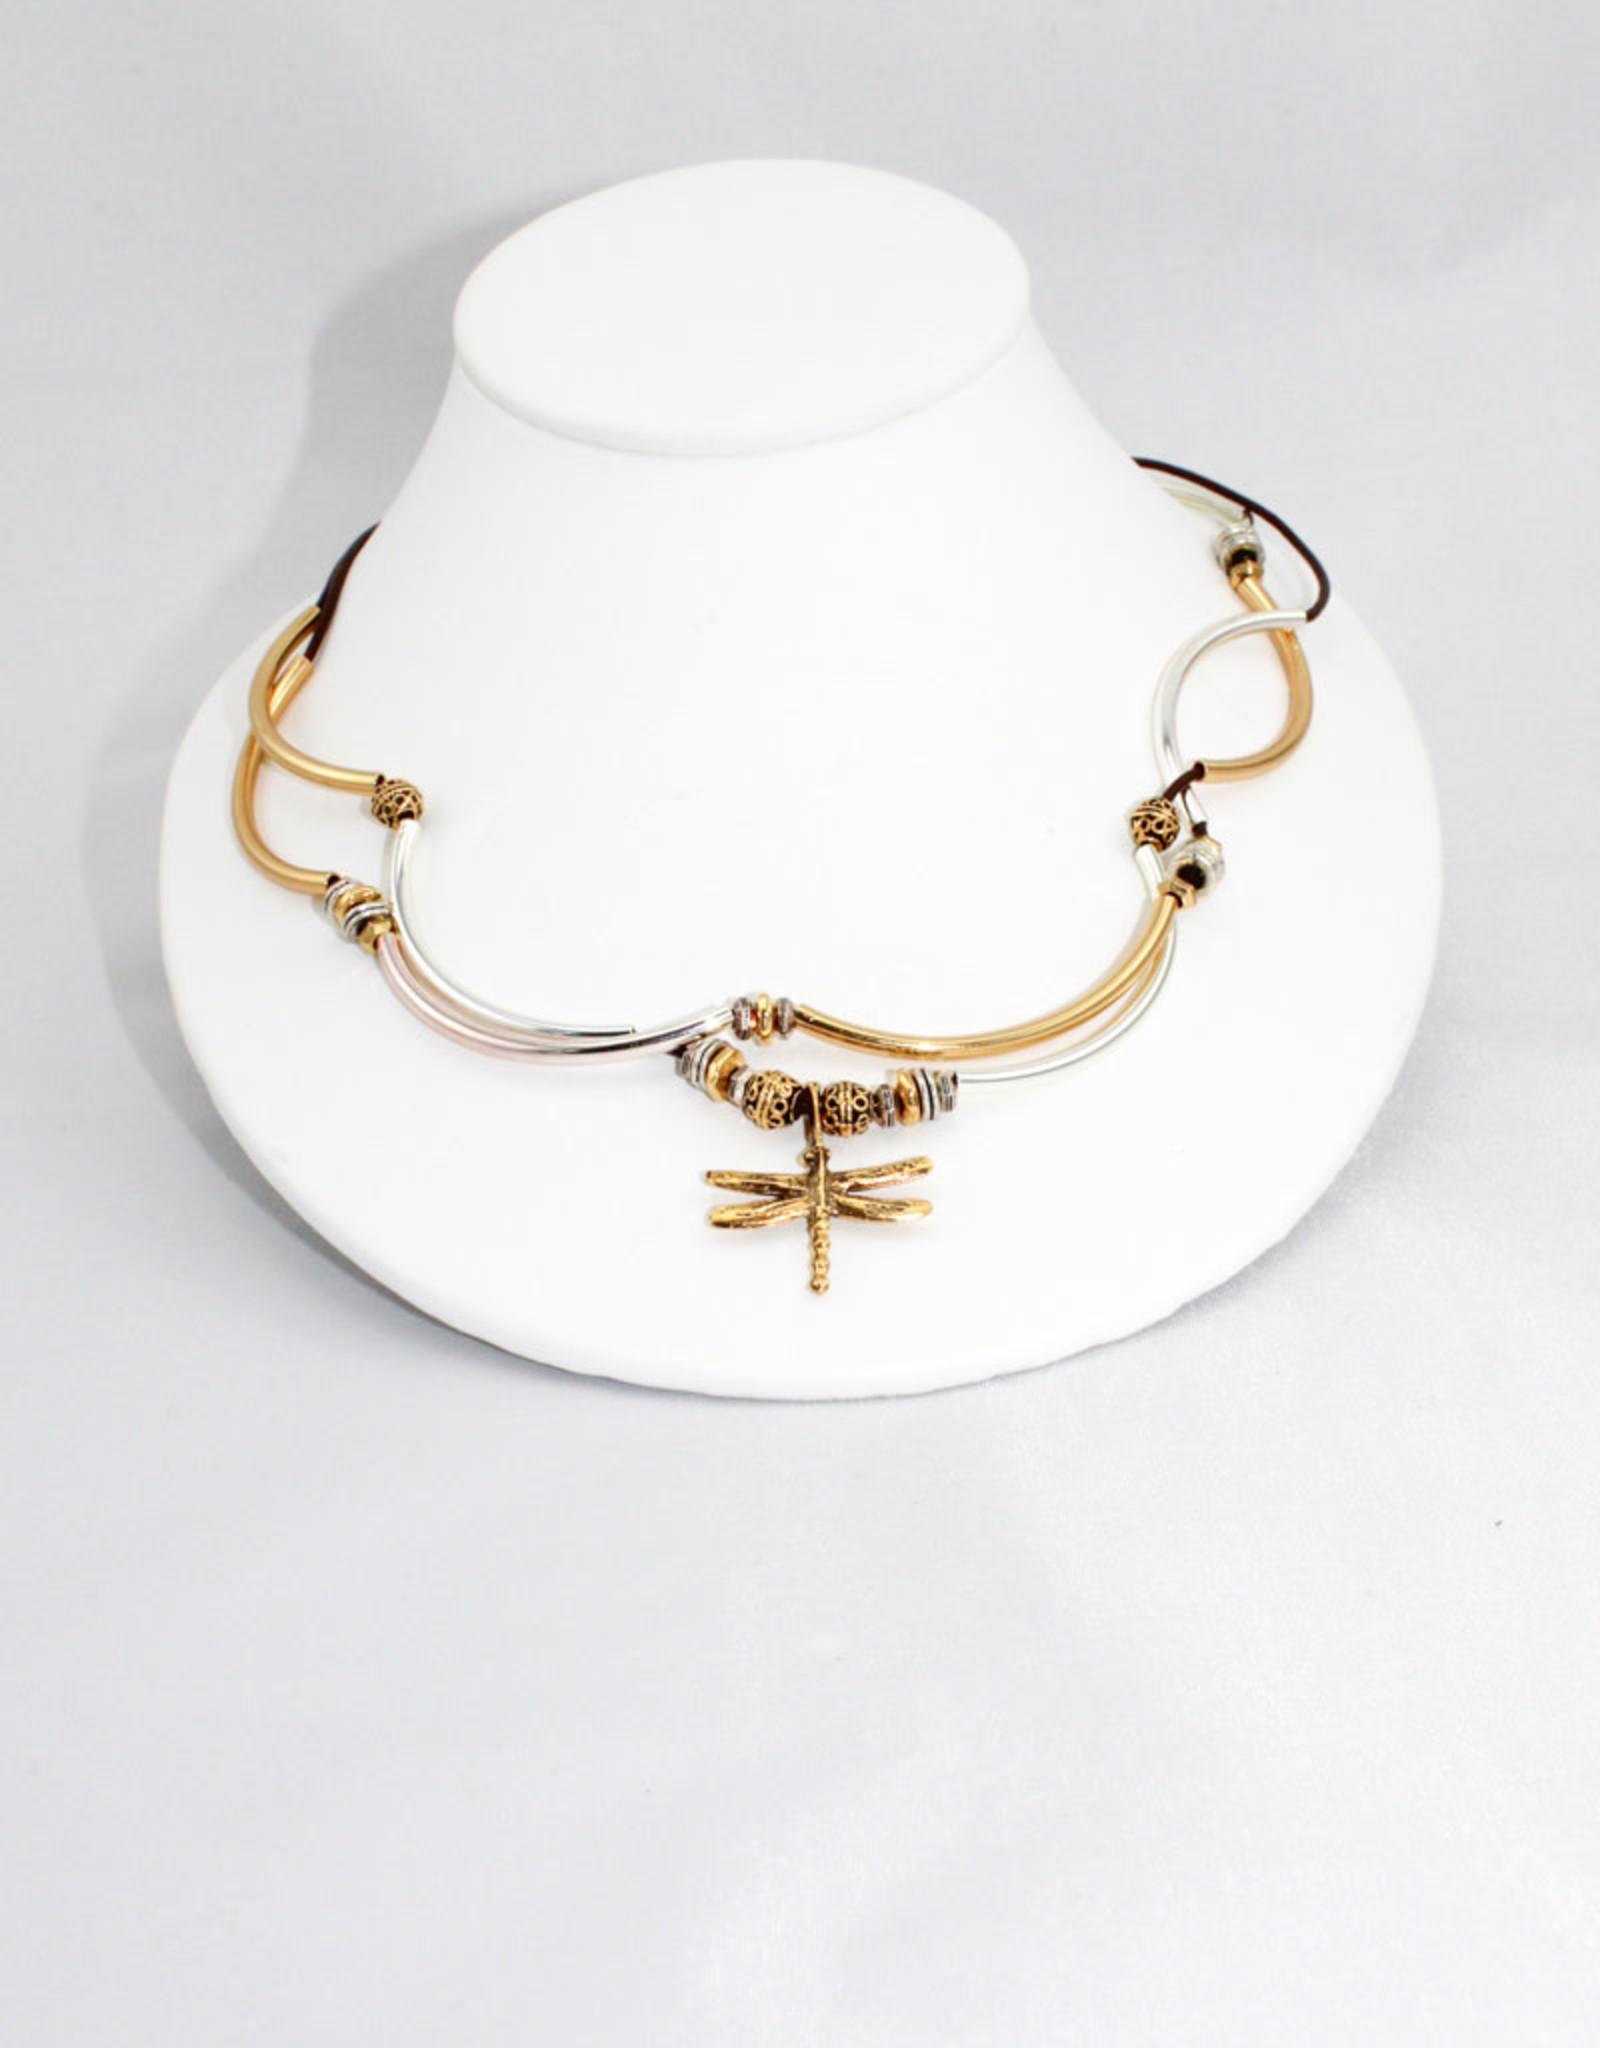 Lizzy James Misty-Gloss Chocolate-2-SG-M Bracelet